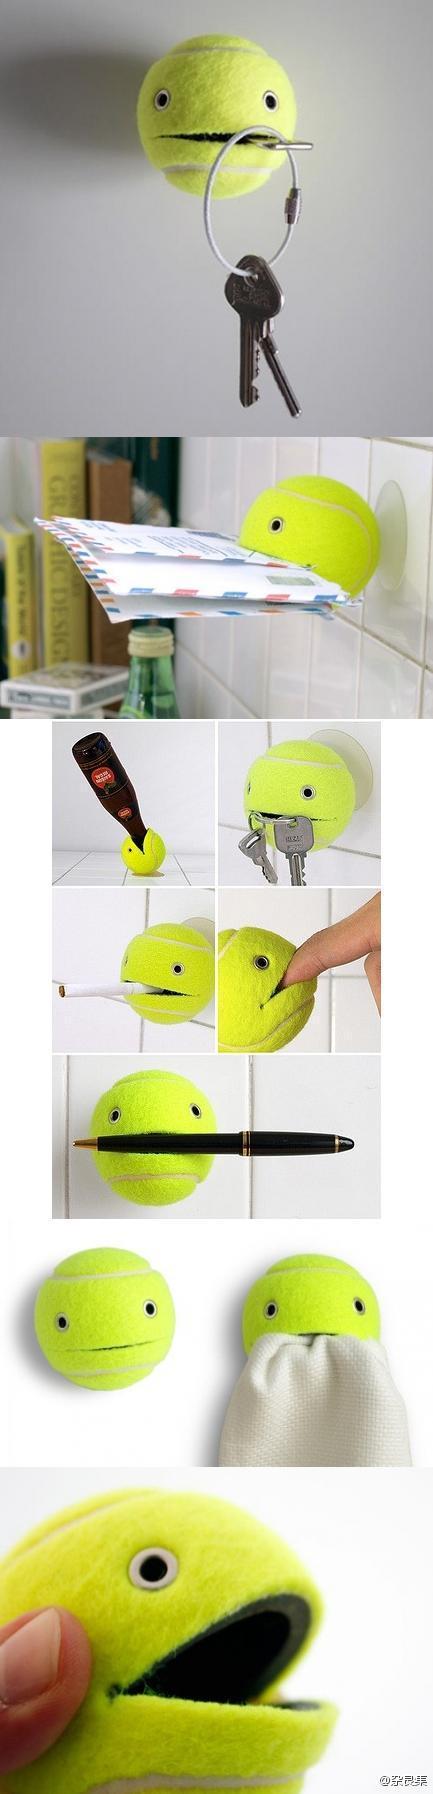 recycle tennis balls